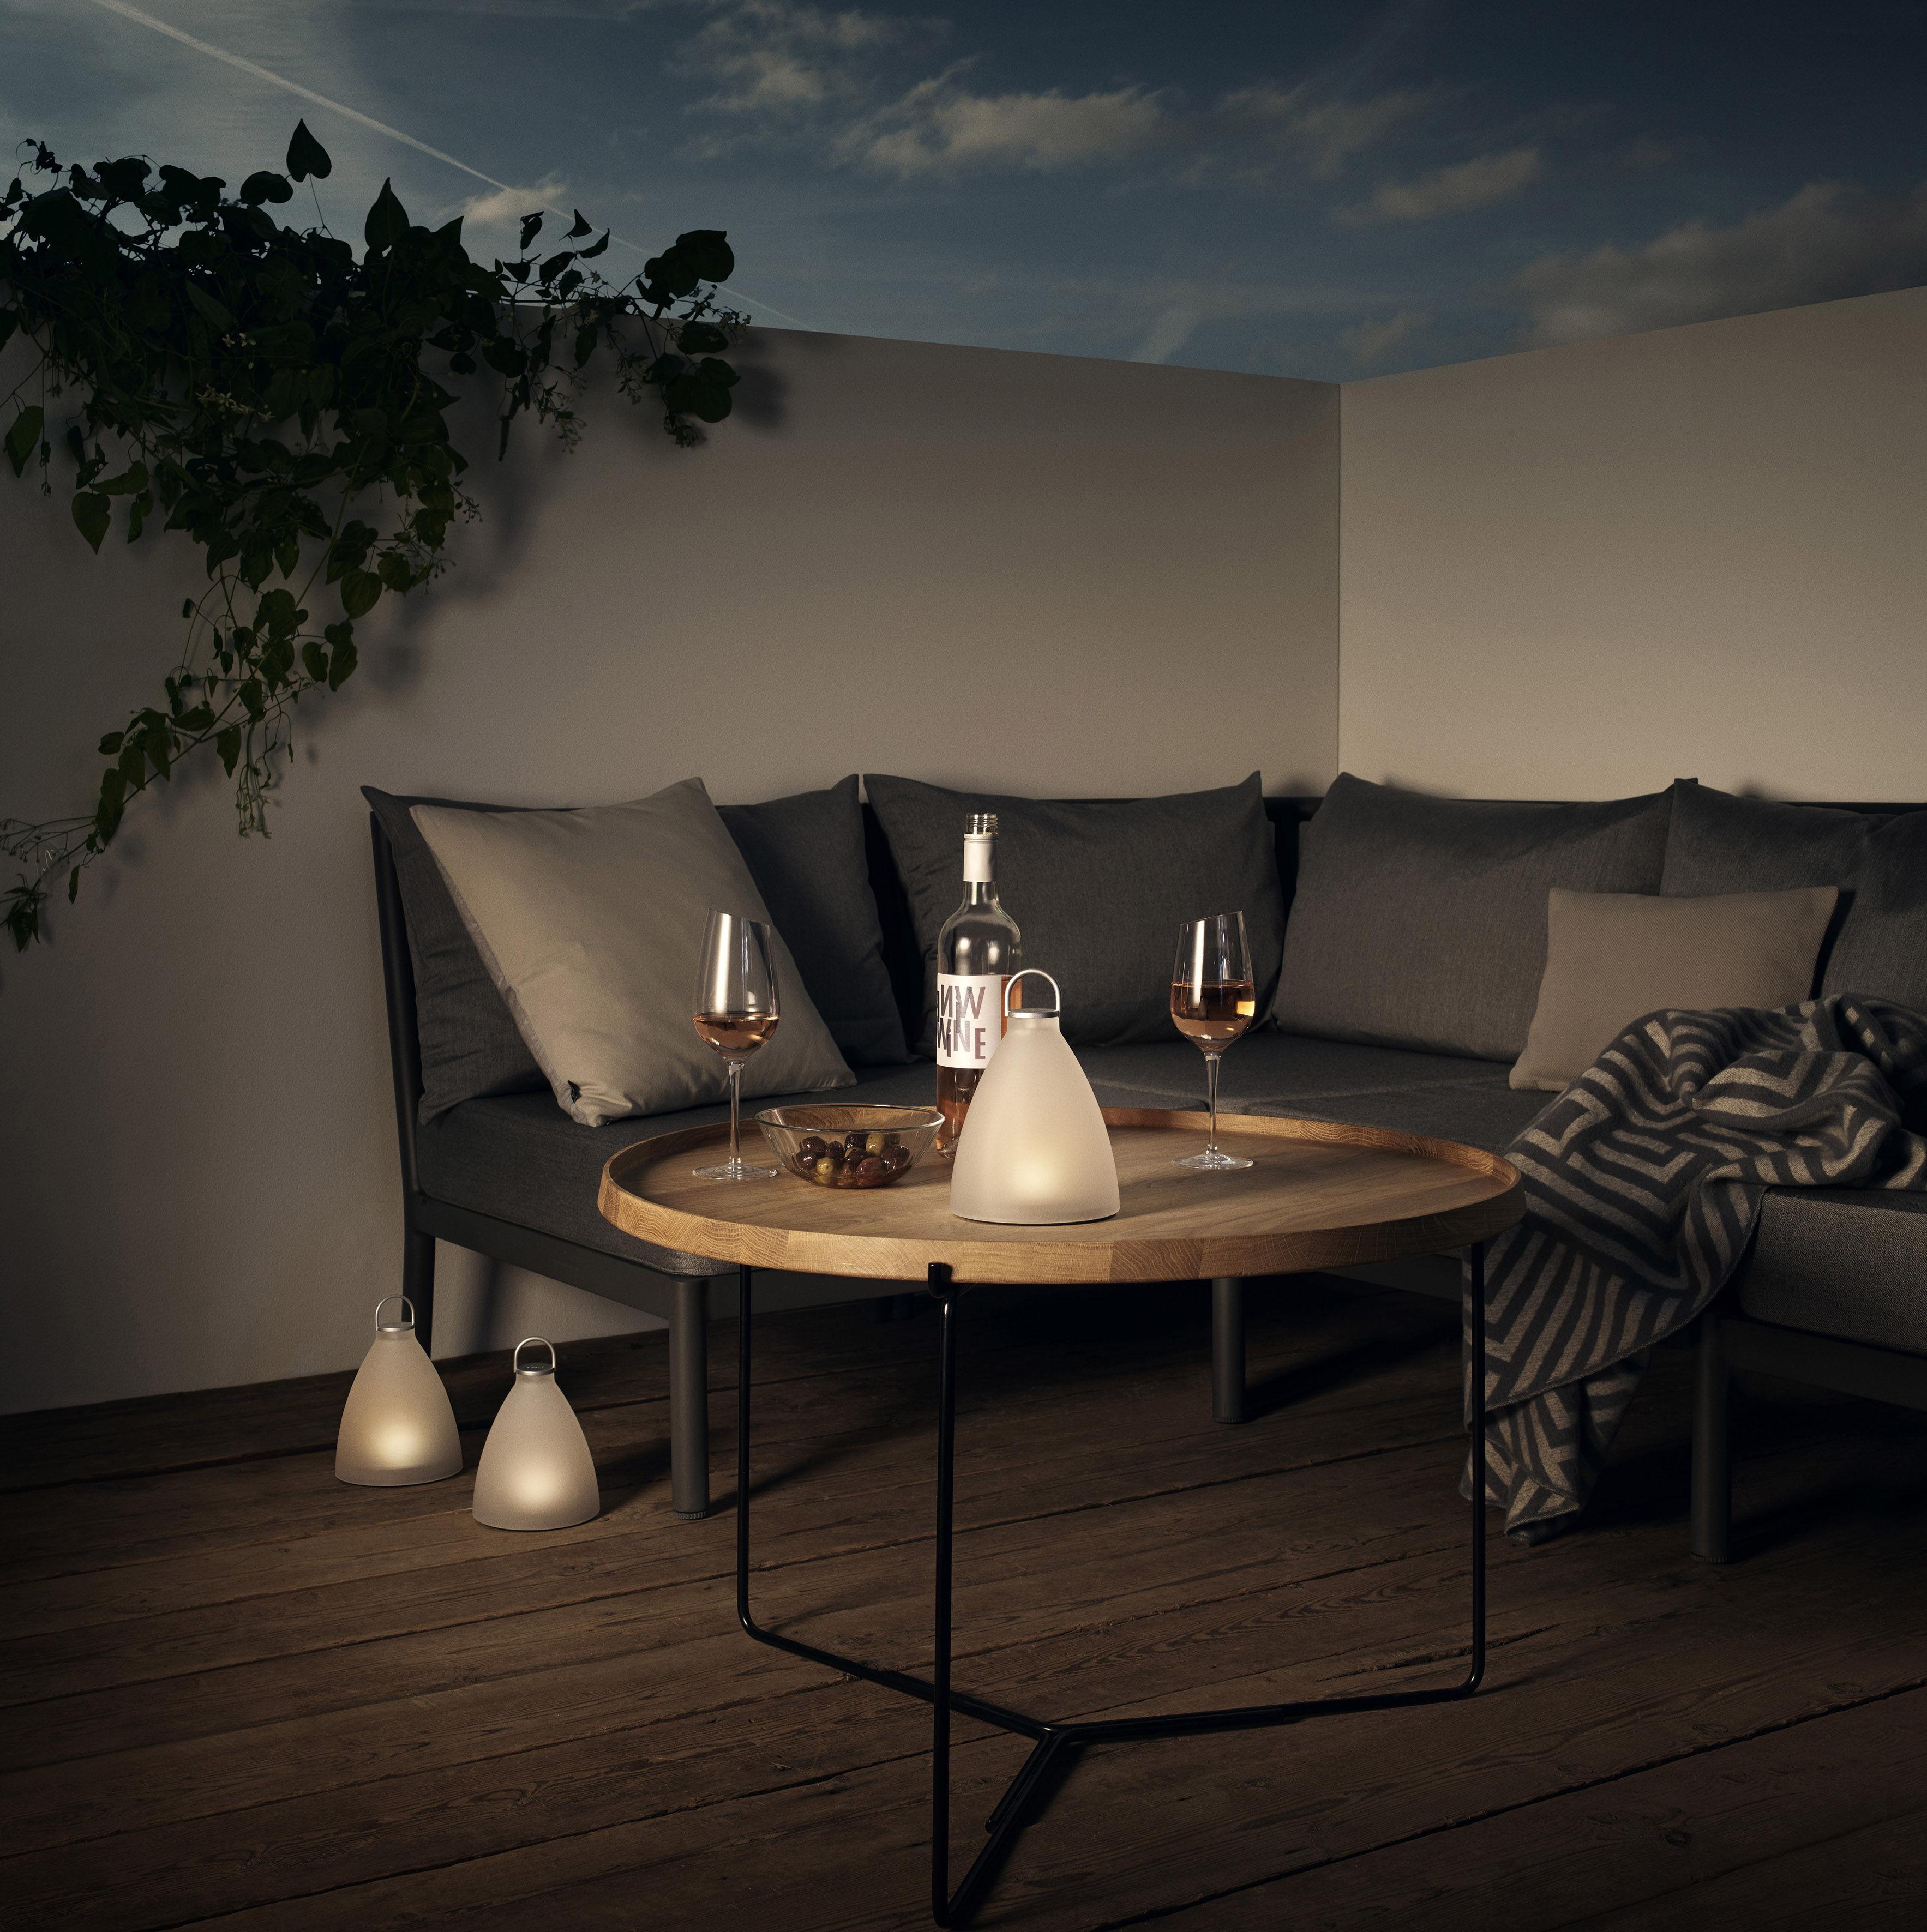 sunlight bell solar lamp wireless h 20 cm white by. Black Bedroom Furniture Sets. Home Design Ideas